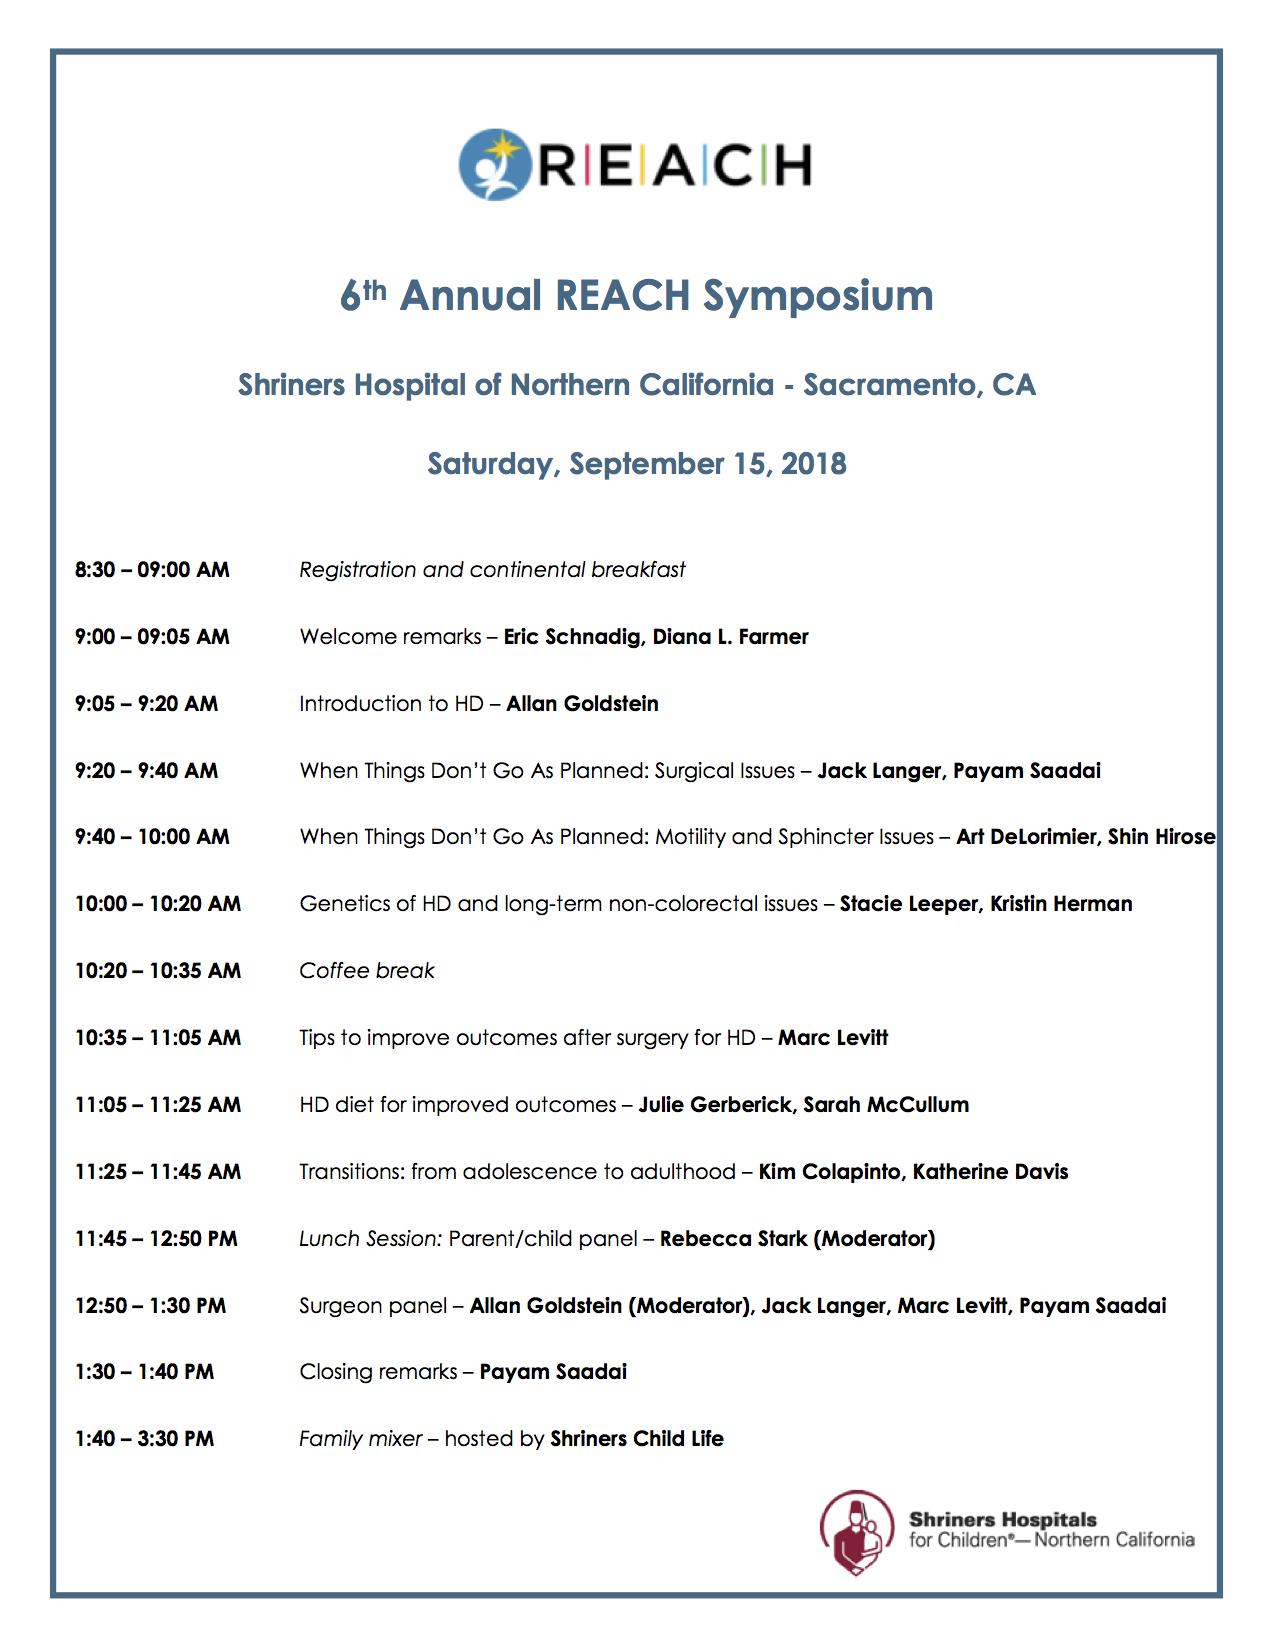 REACH Symposium Agenda Sept 15th 2018.jpg